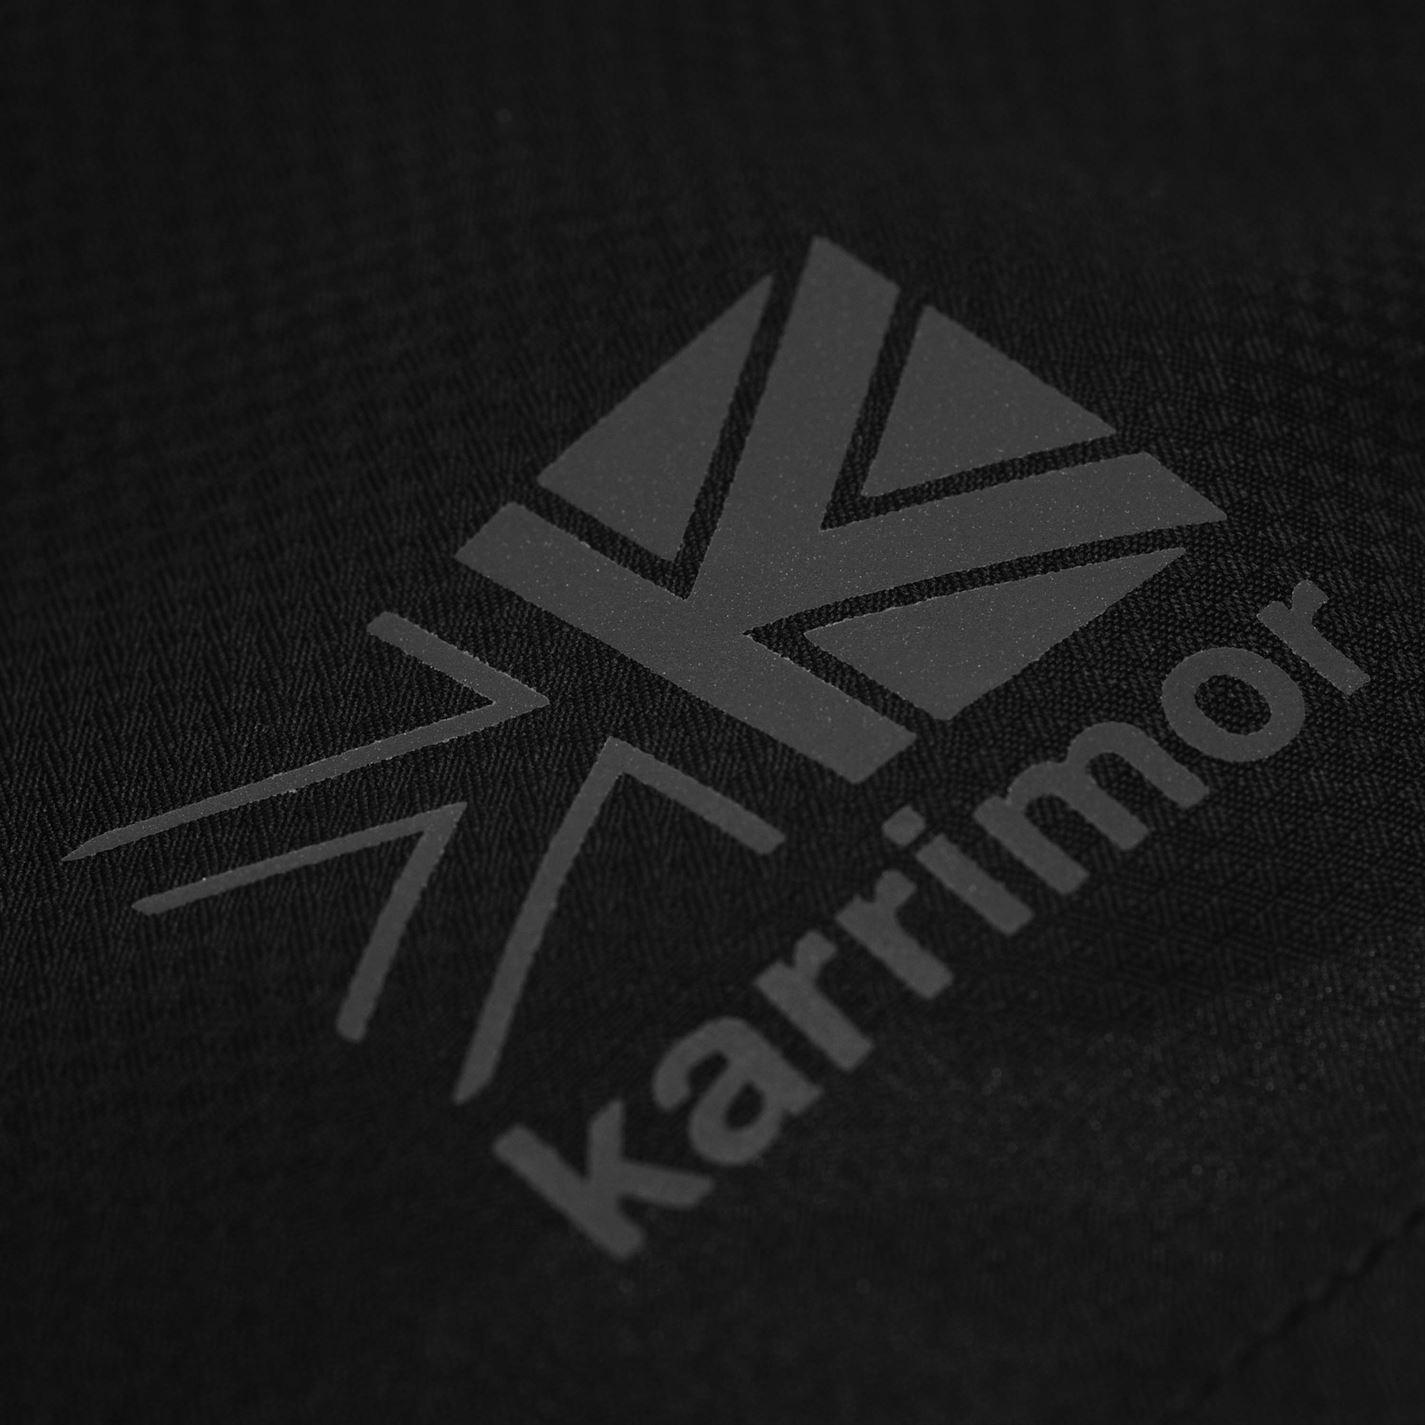 Karrimor-Xlite-5inch-Running-Shorts-Performance-Mens thumbnail 10